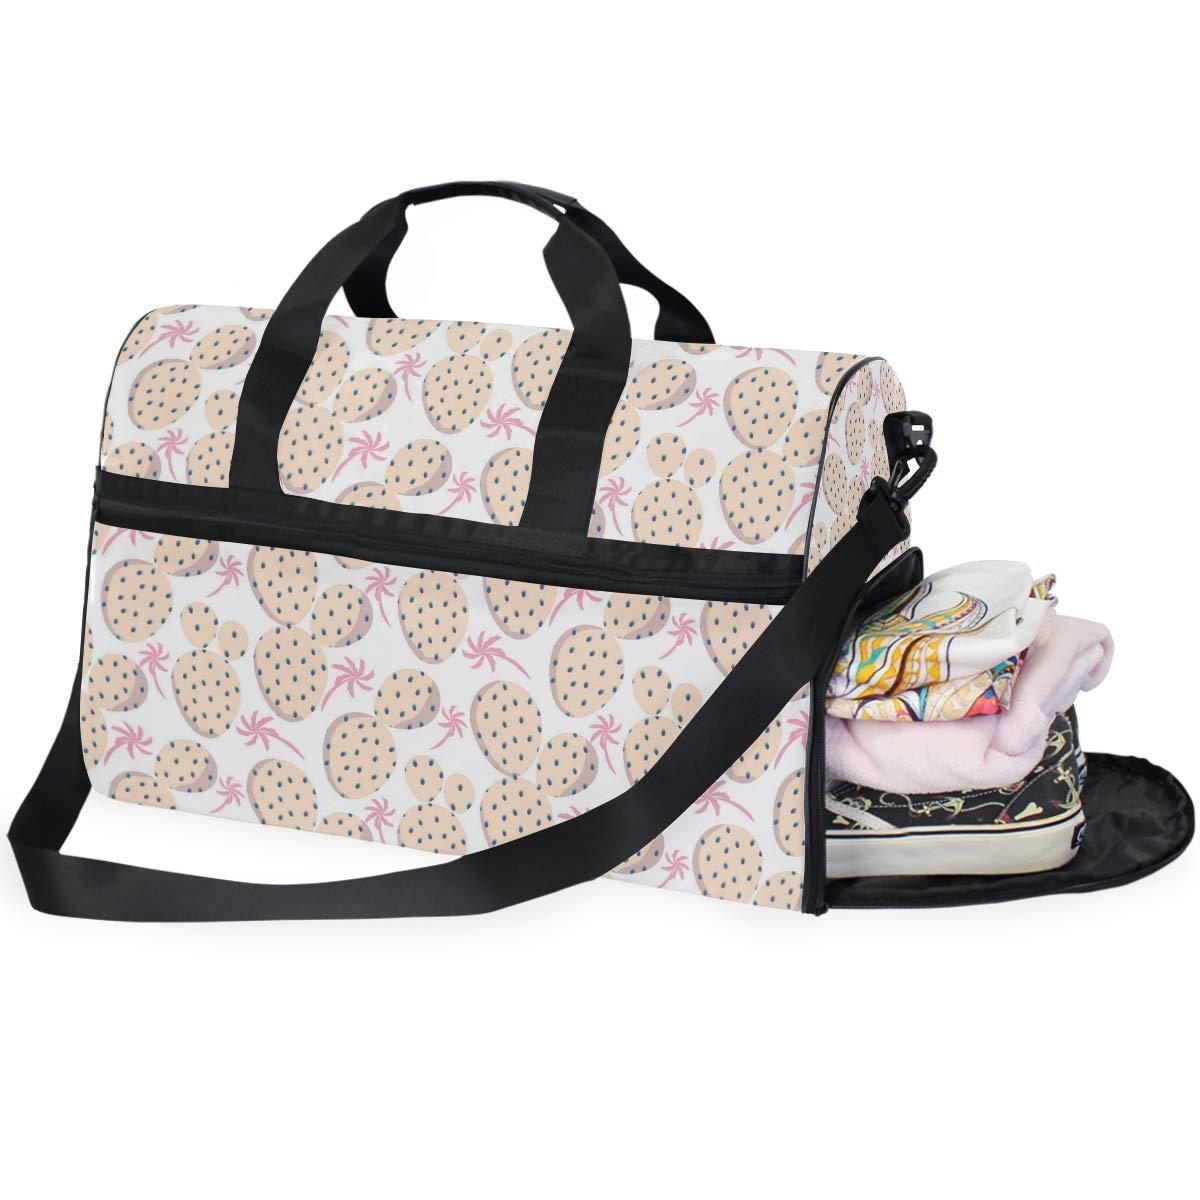 Pink Coconut Tree Orange Cactus Large Travel Duffel Bag For Women Men Overnight Weekend Lightweight Luggage Bag